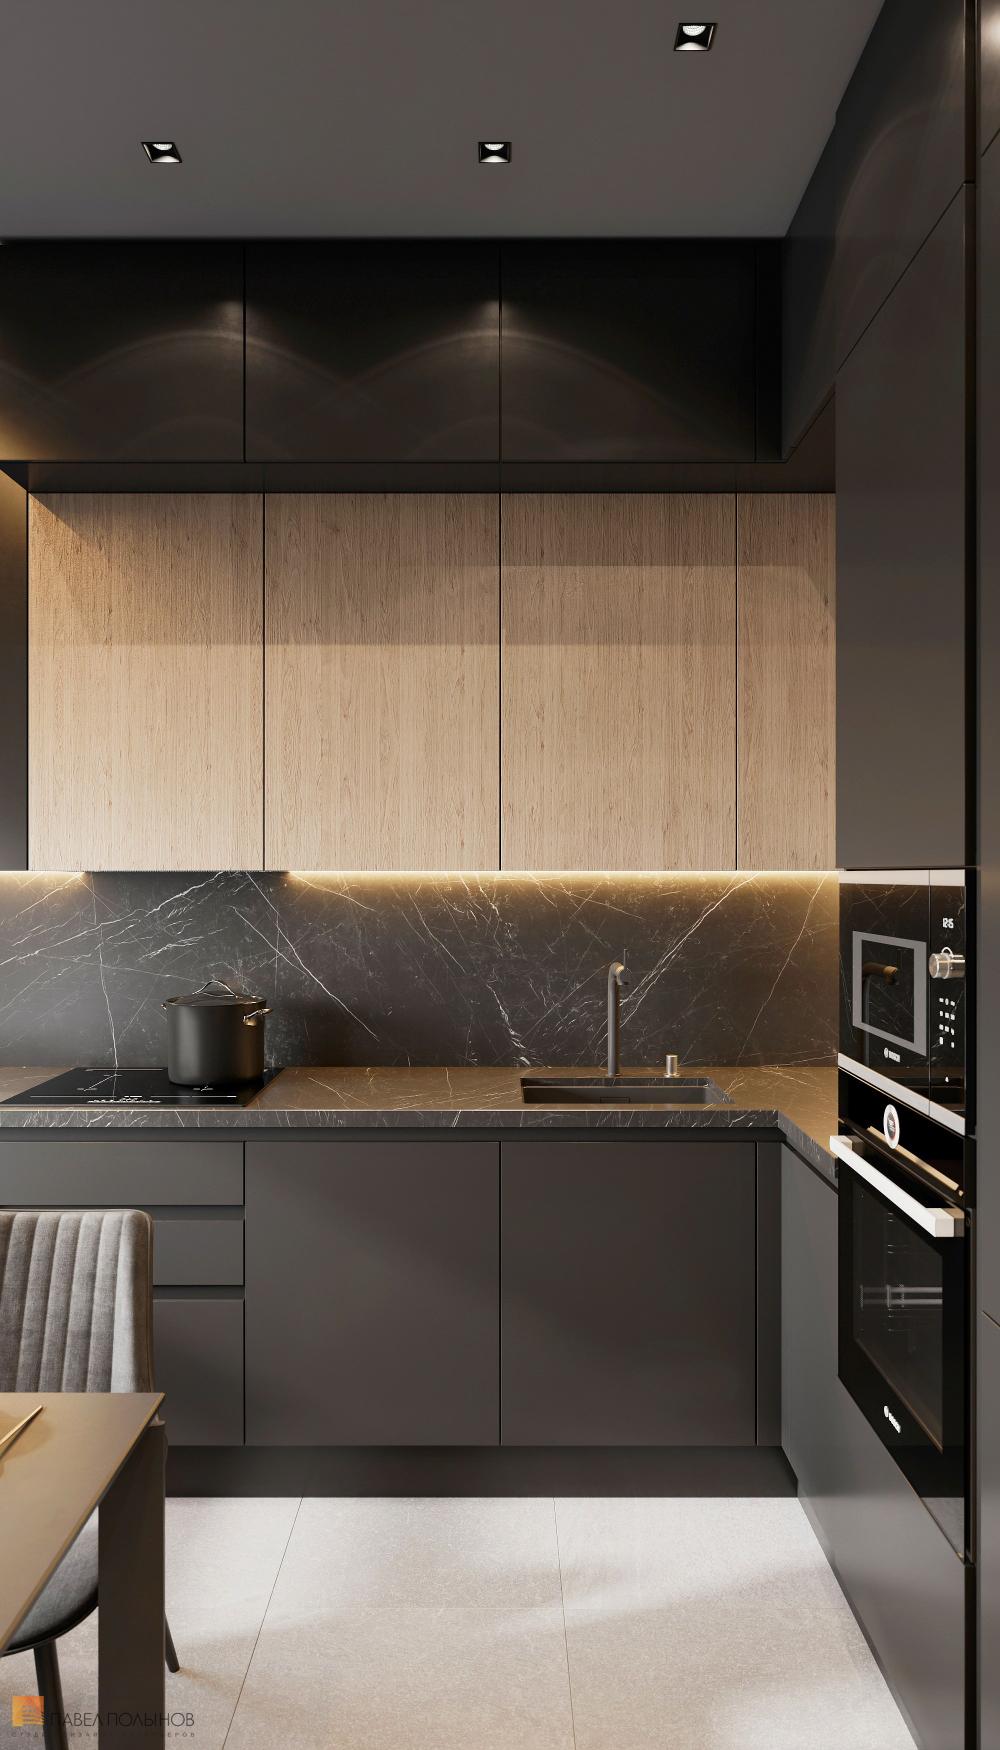 Фото: Дизайн кухни - Интерьер квартиры в современн